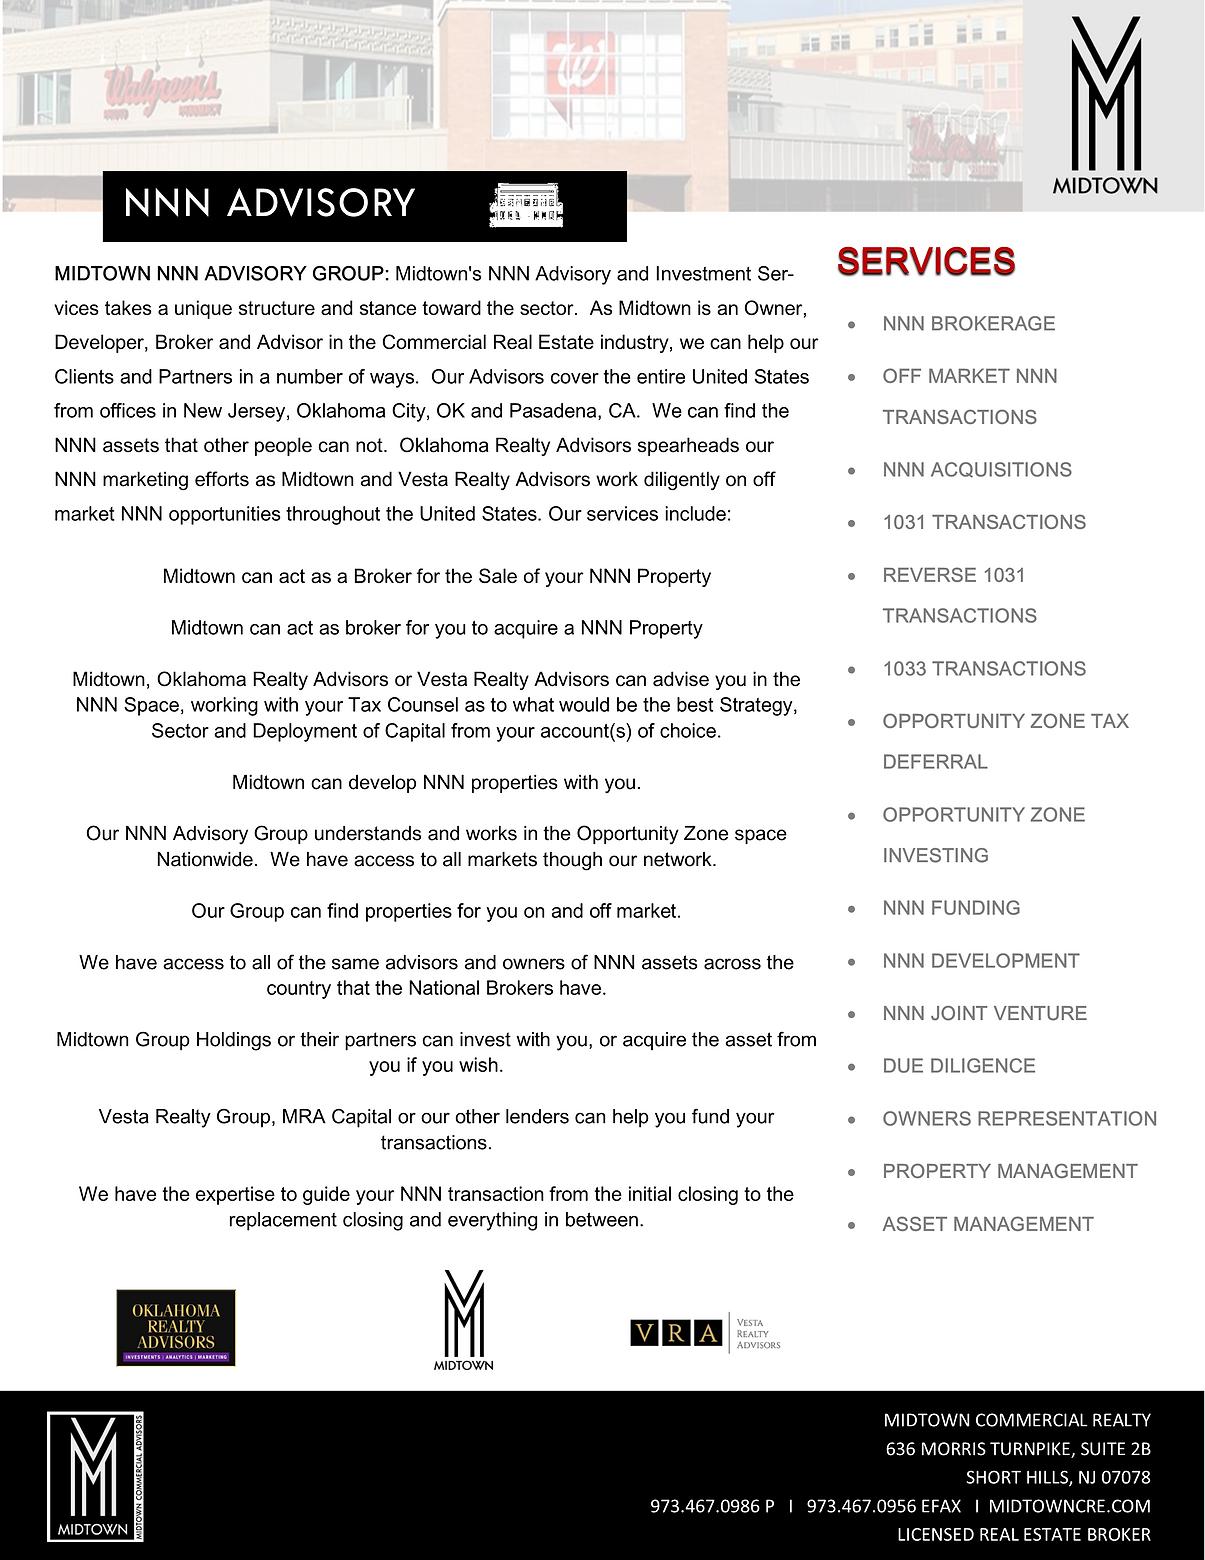 Midtown NNN ADVISORY 1.2021.png